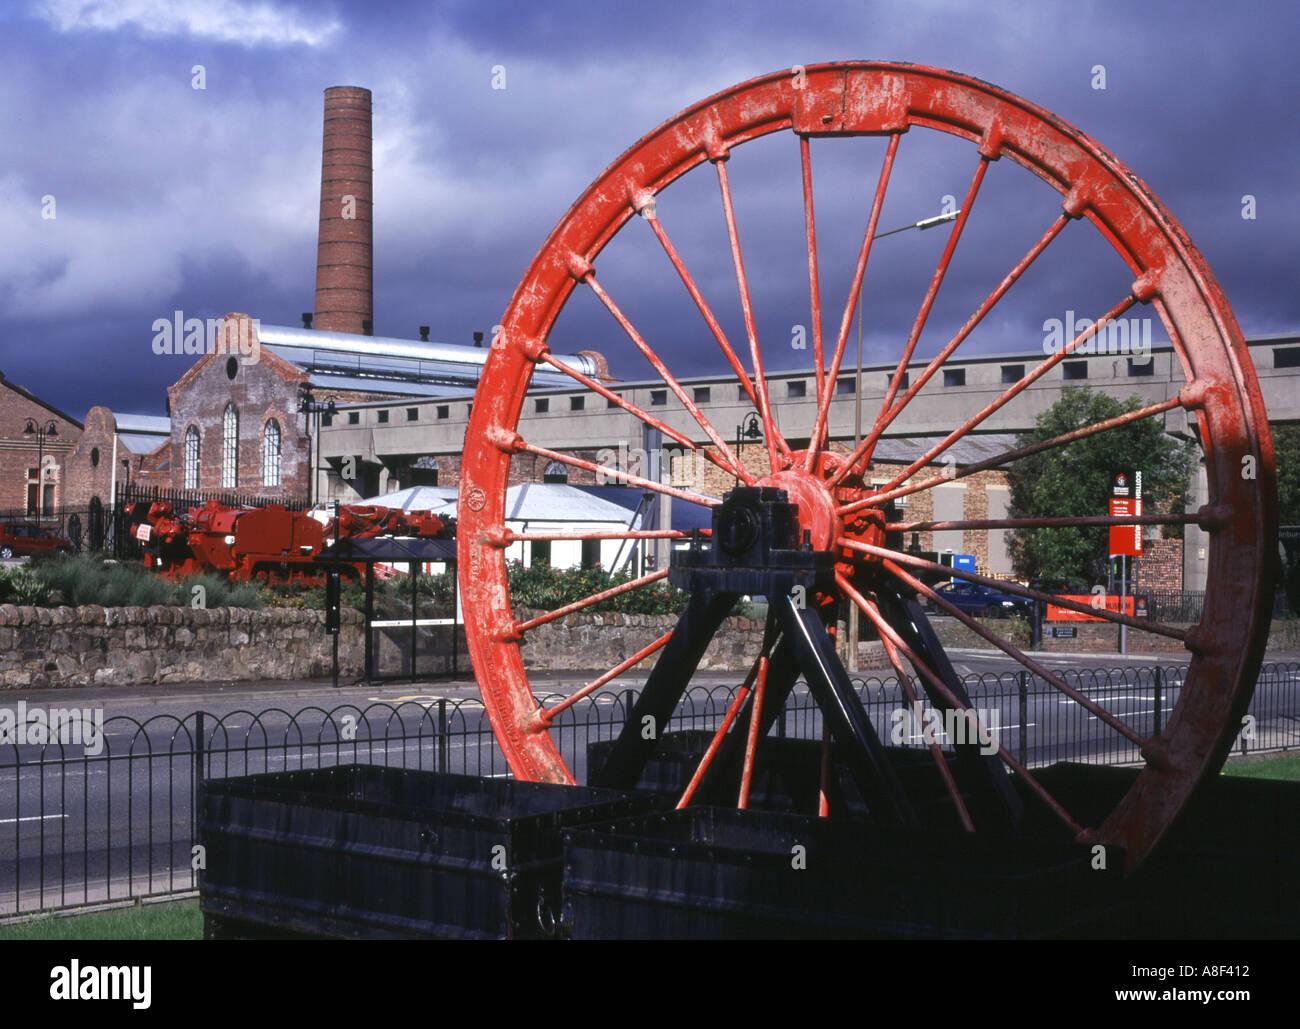 dh Scottish Mining Museum NEWTONGRANGE LOTHIAN Colliery buildings coal scotland historical mine pithead wheel history Stock Photo